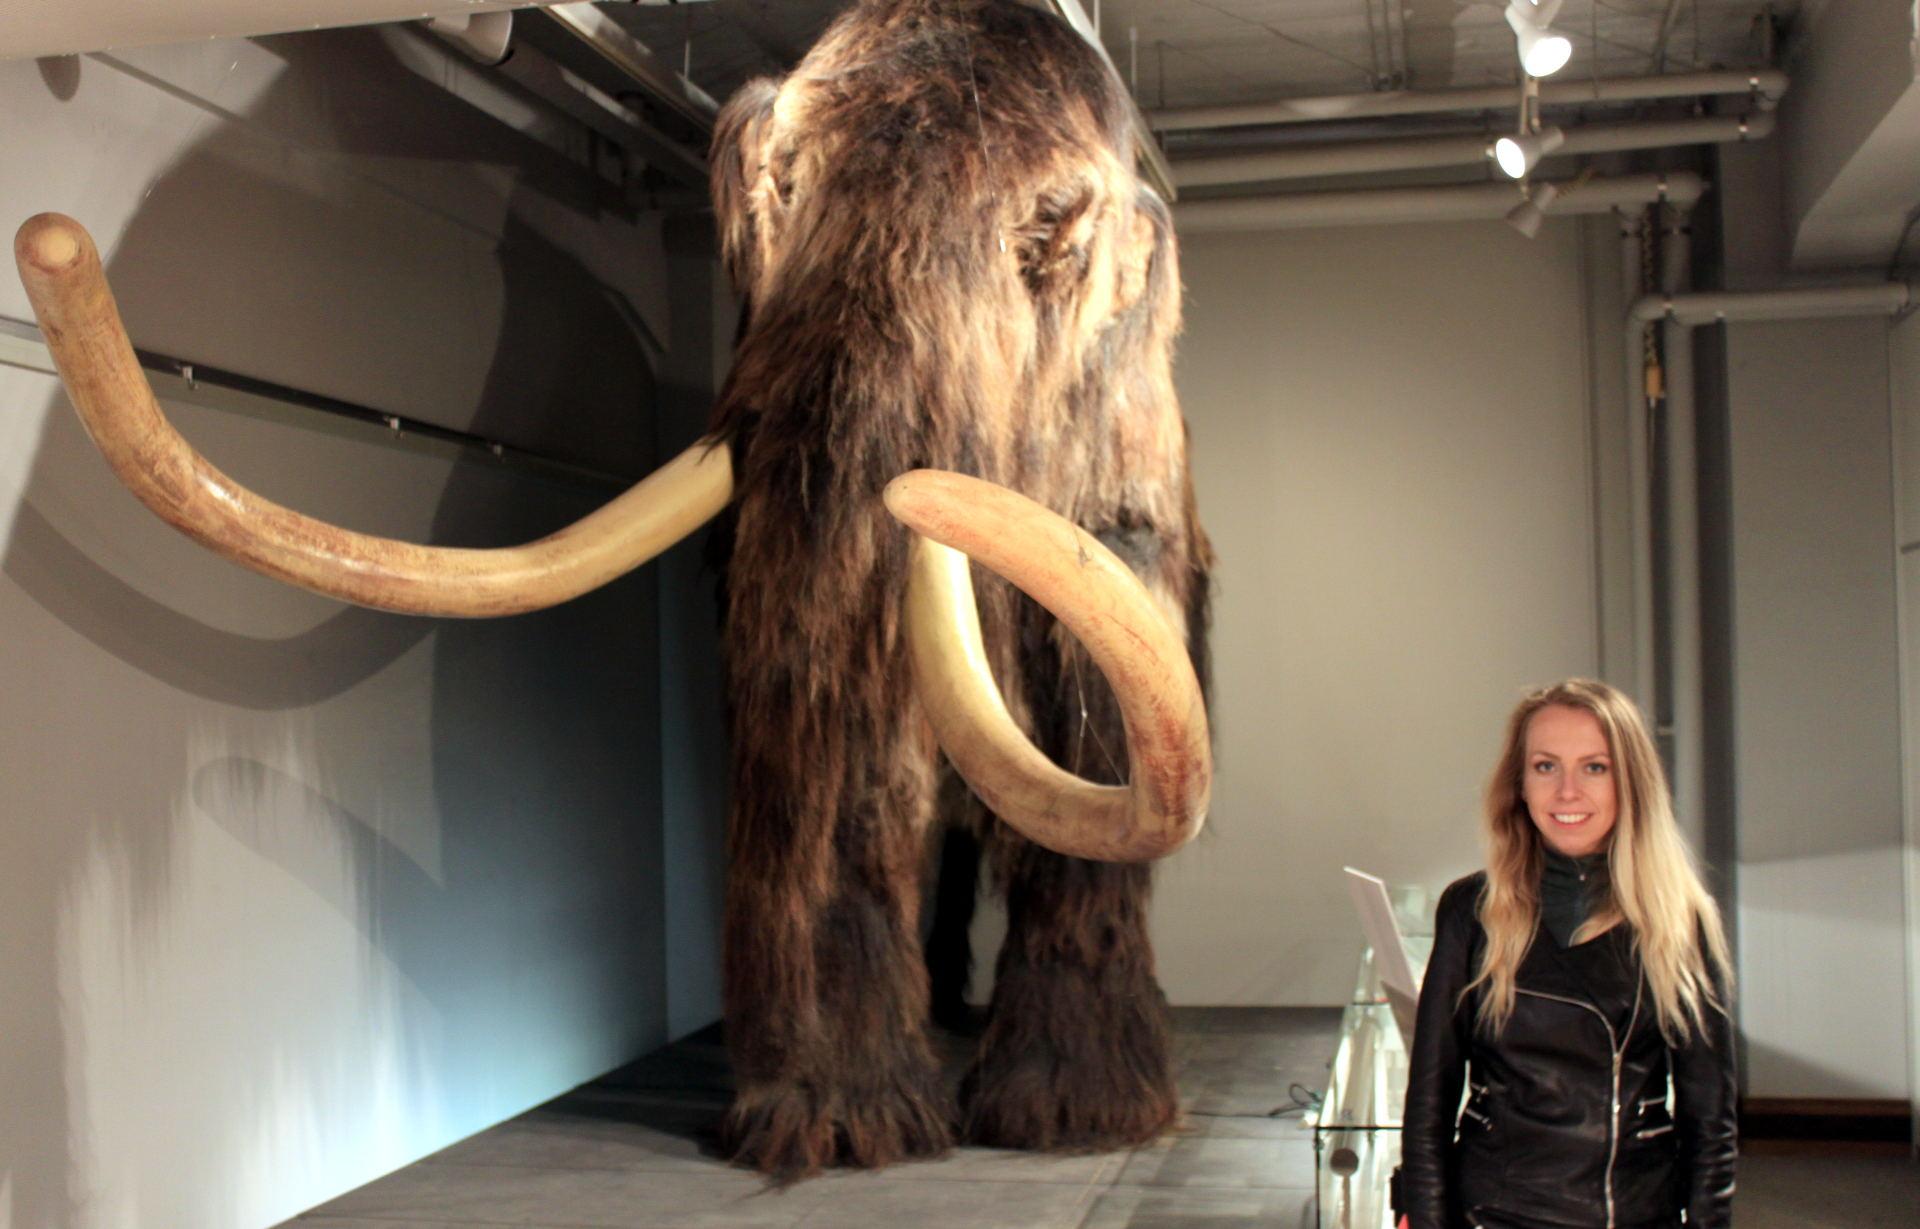 japonia sapporo muzeum hokkaidomuzeumuniwersyteckie hokkaidouniversitymuseum historiahokkaido muzeumhokkaido muzeumsapporo mamut iglawpodrozy